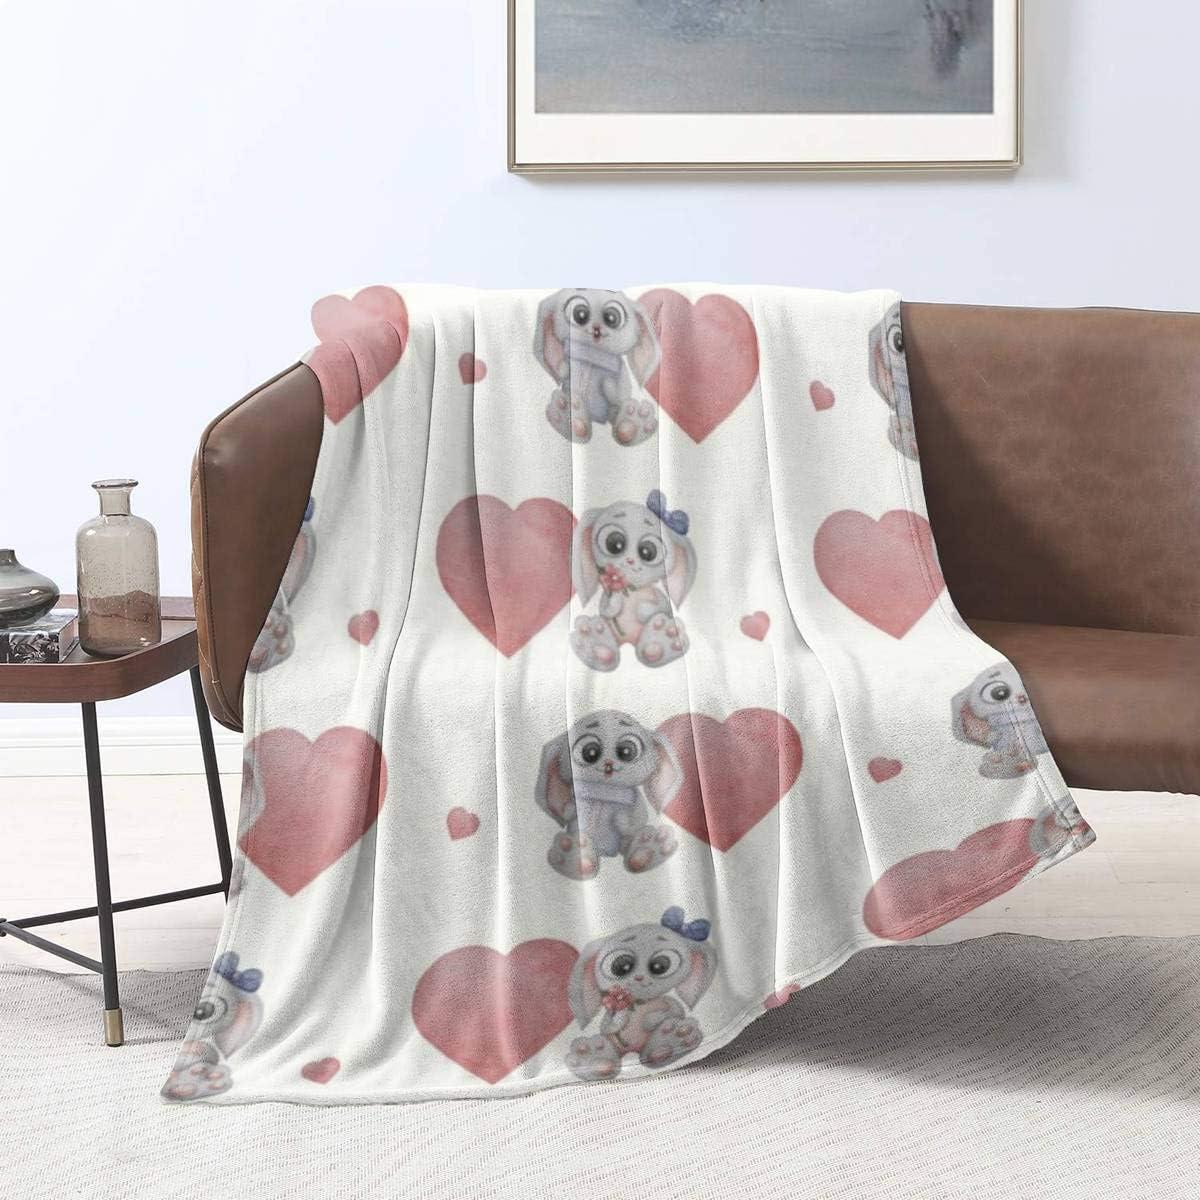 Limited time trial price service Ellekiwi Flannel Blanket Seamless Pattern Little Gr Animals Cute